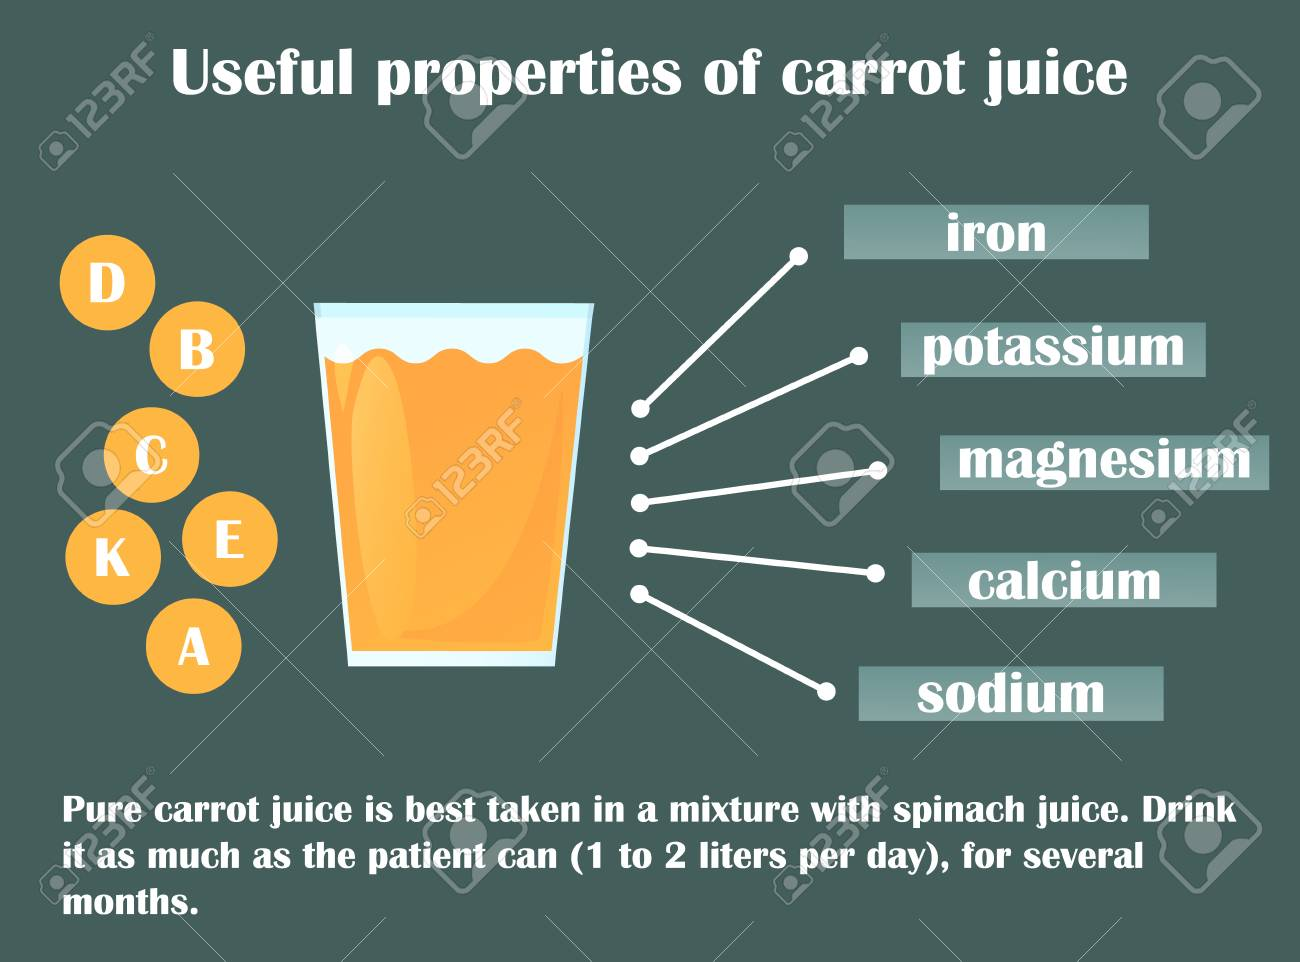 Carrot Juice: Useful Properties 84